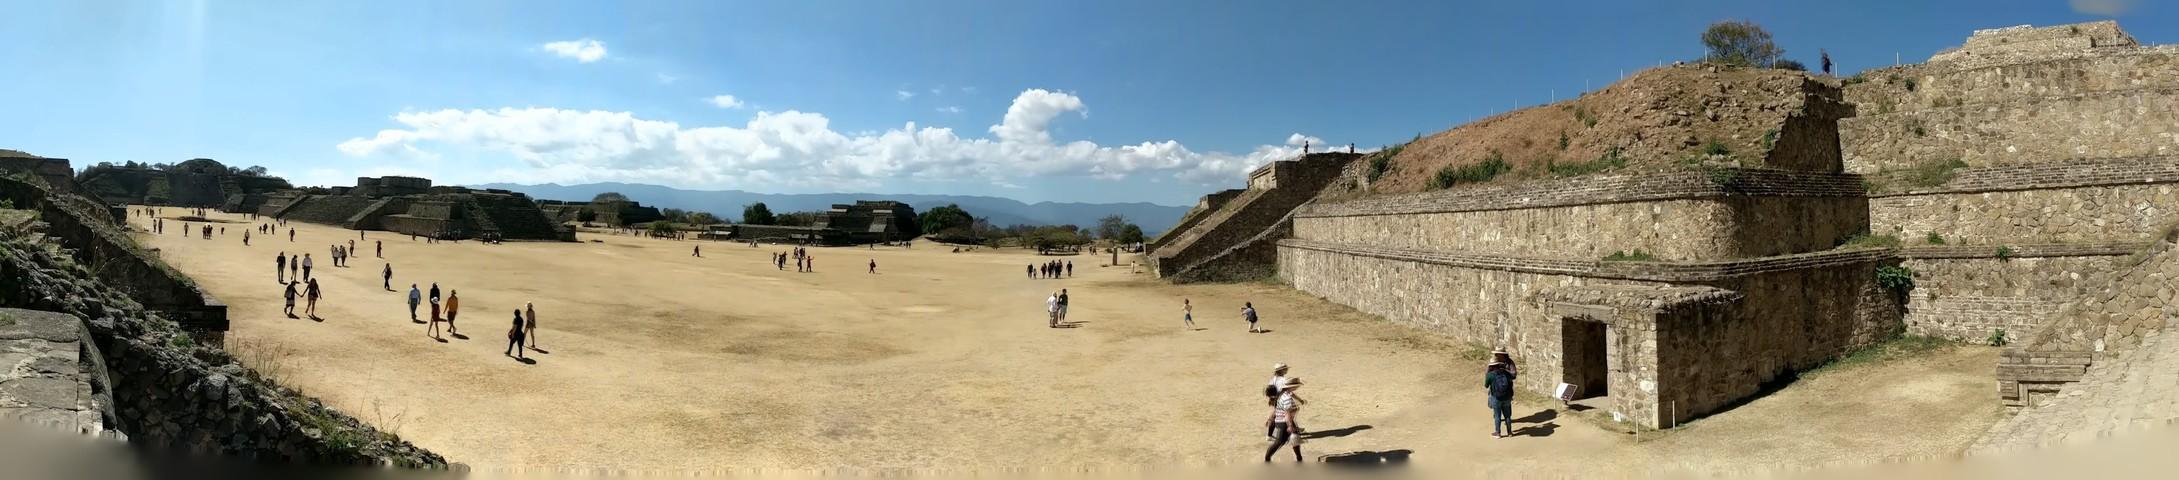 The ancient city of Monte Albán, capitol of the Zapotec civilization.